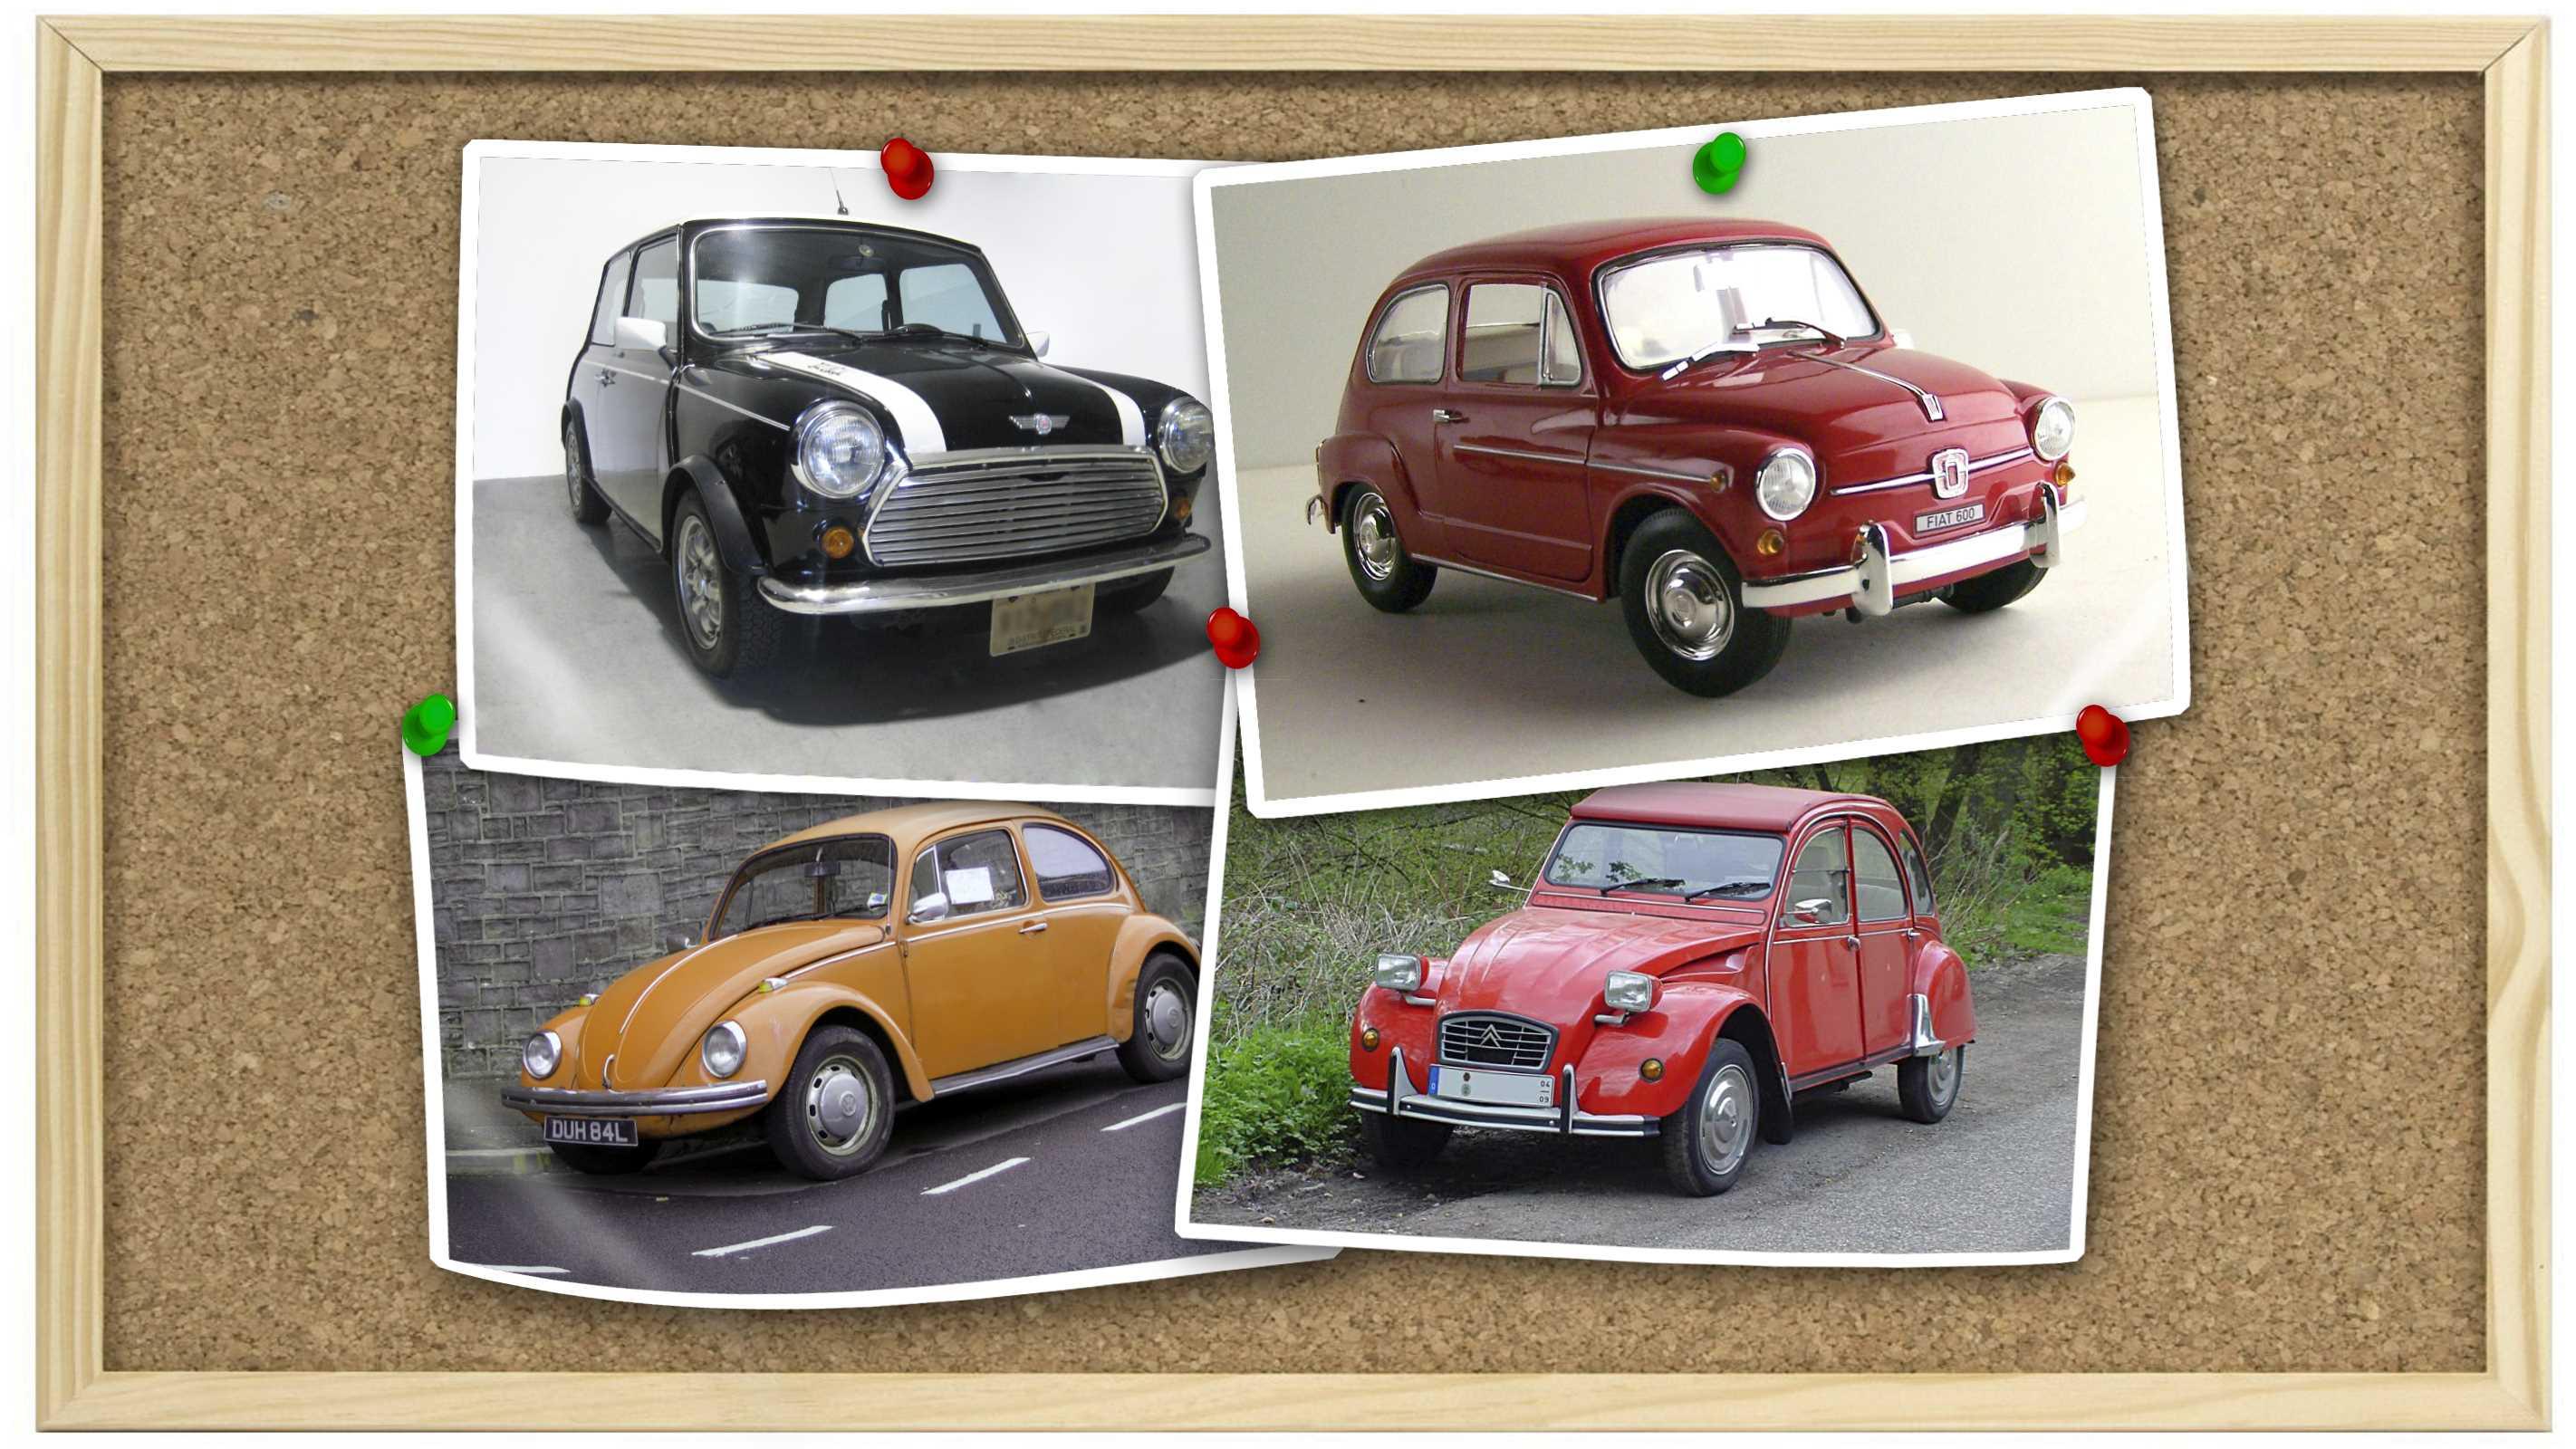 Cool small cars: Mini, 600, Beetle or 2CV - netivist